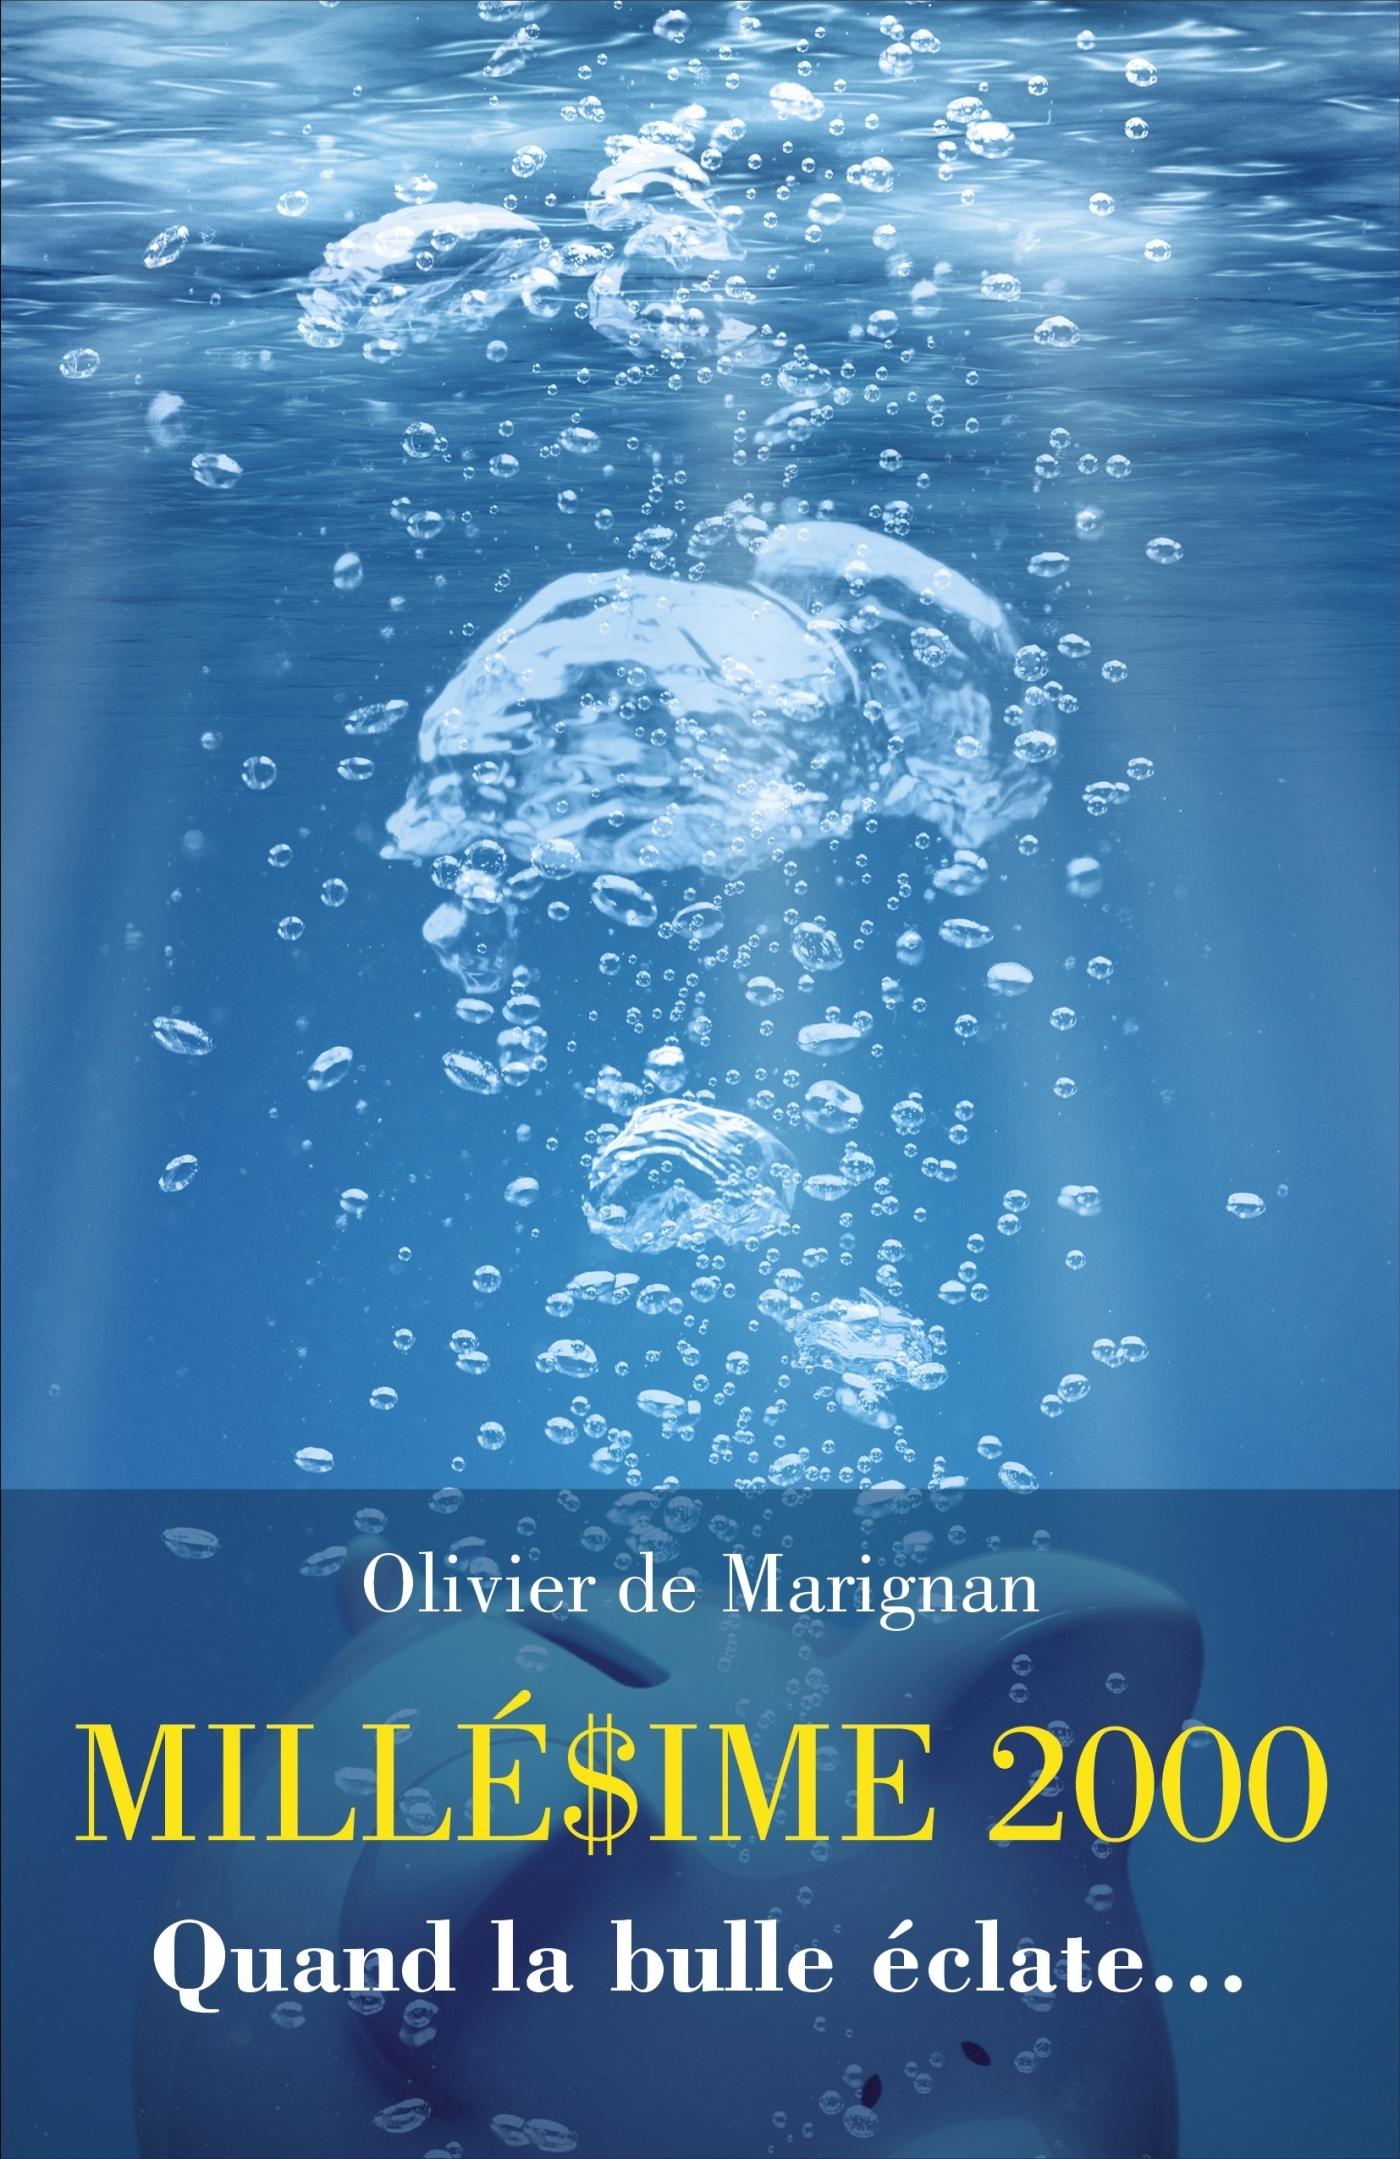 MILLEDIME 2000